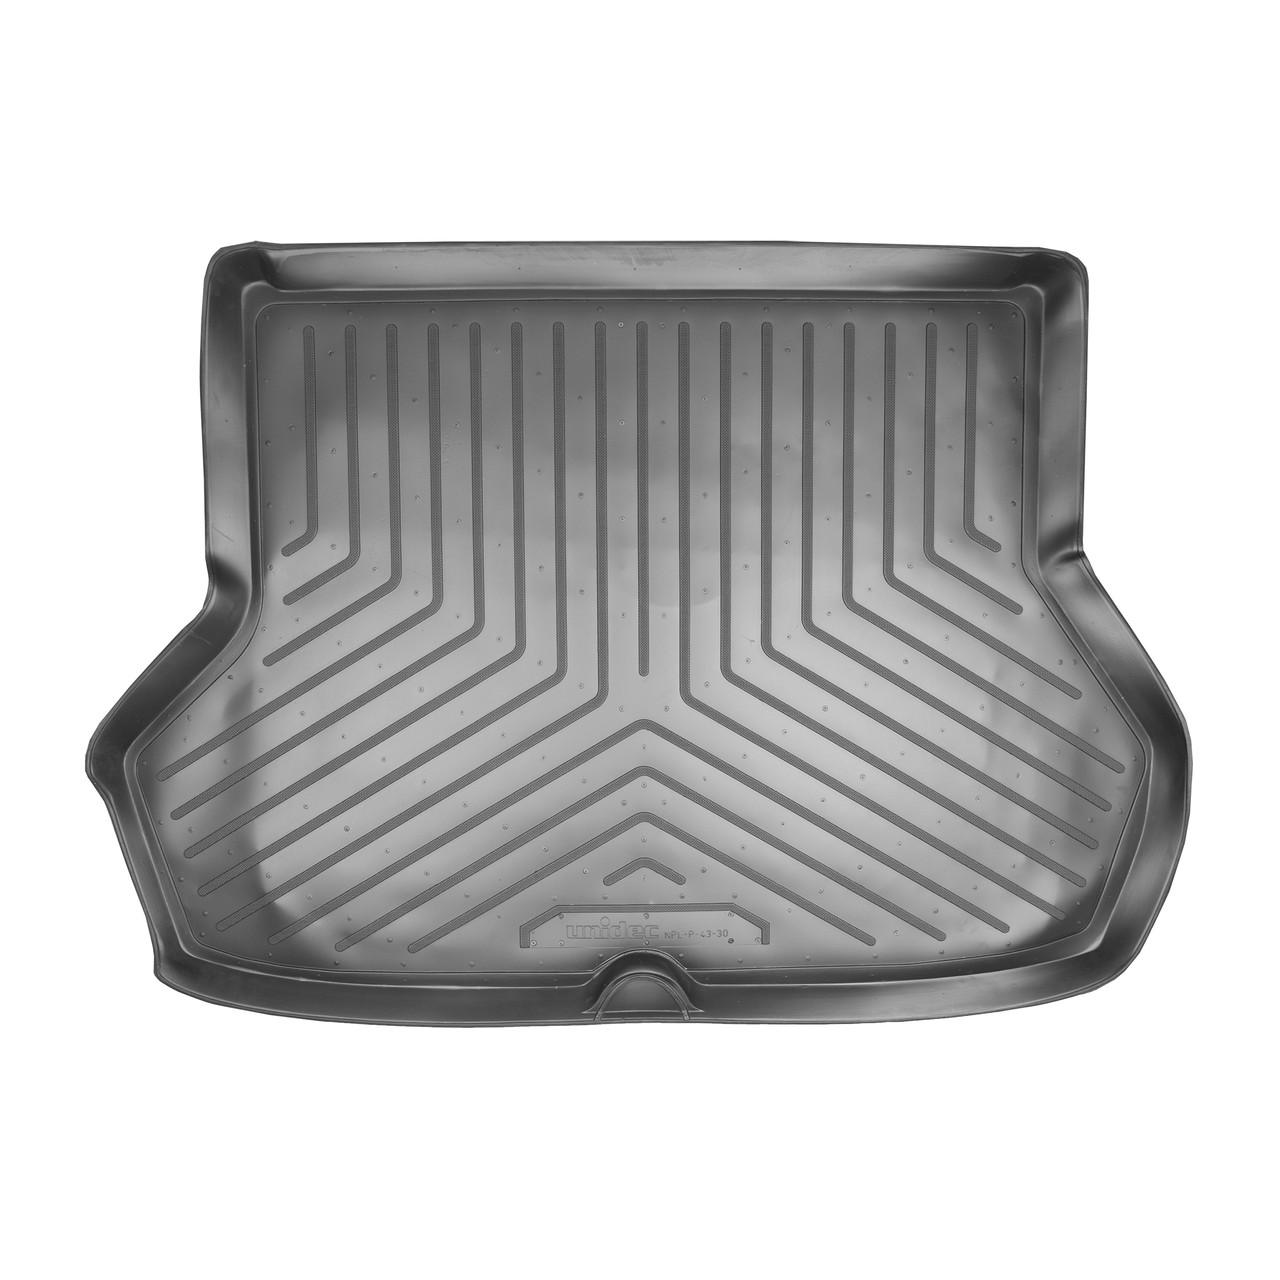 Коврик в багажник Kia Rio седан (2000-2005)